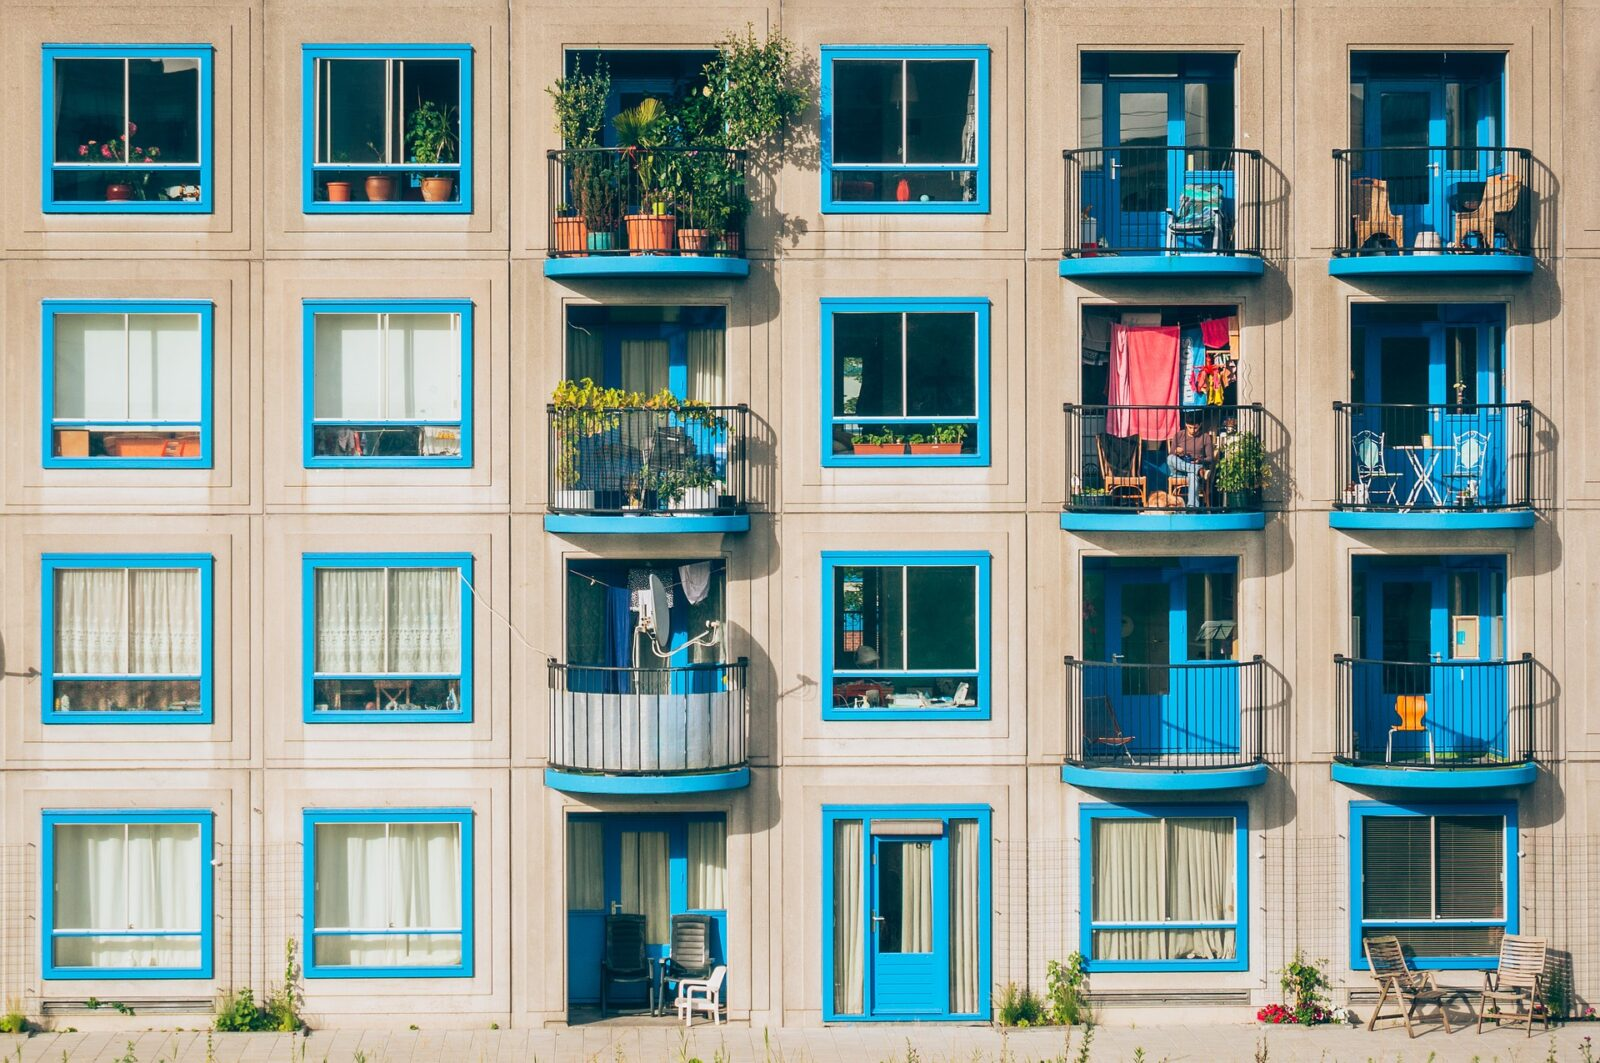 apartments 1845884 1920 1